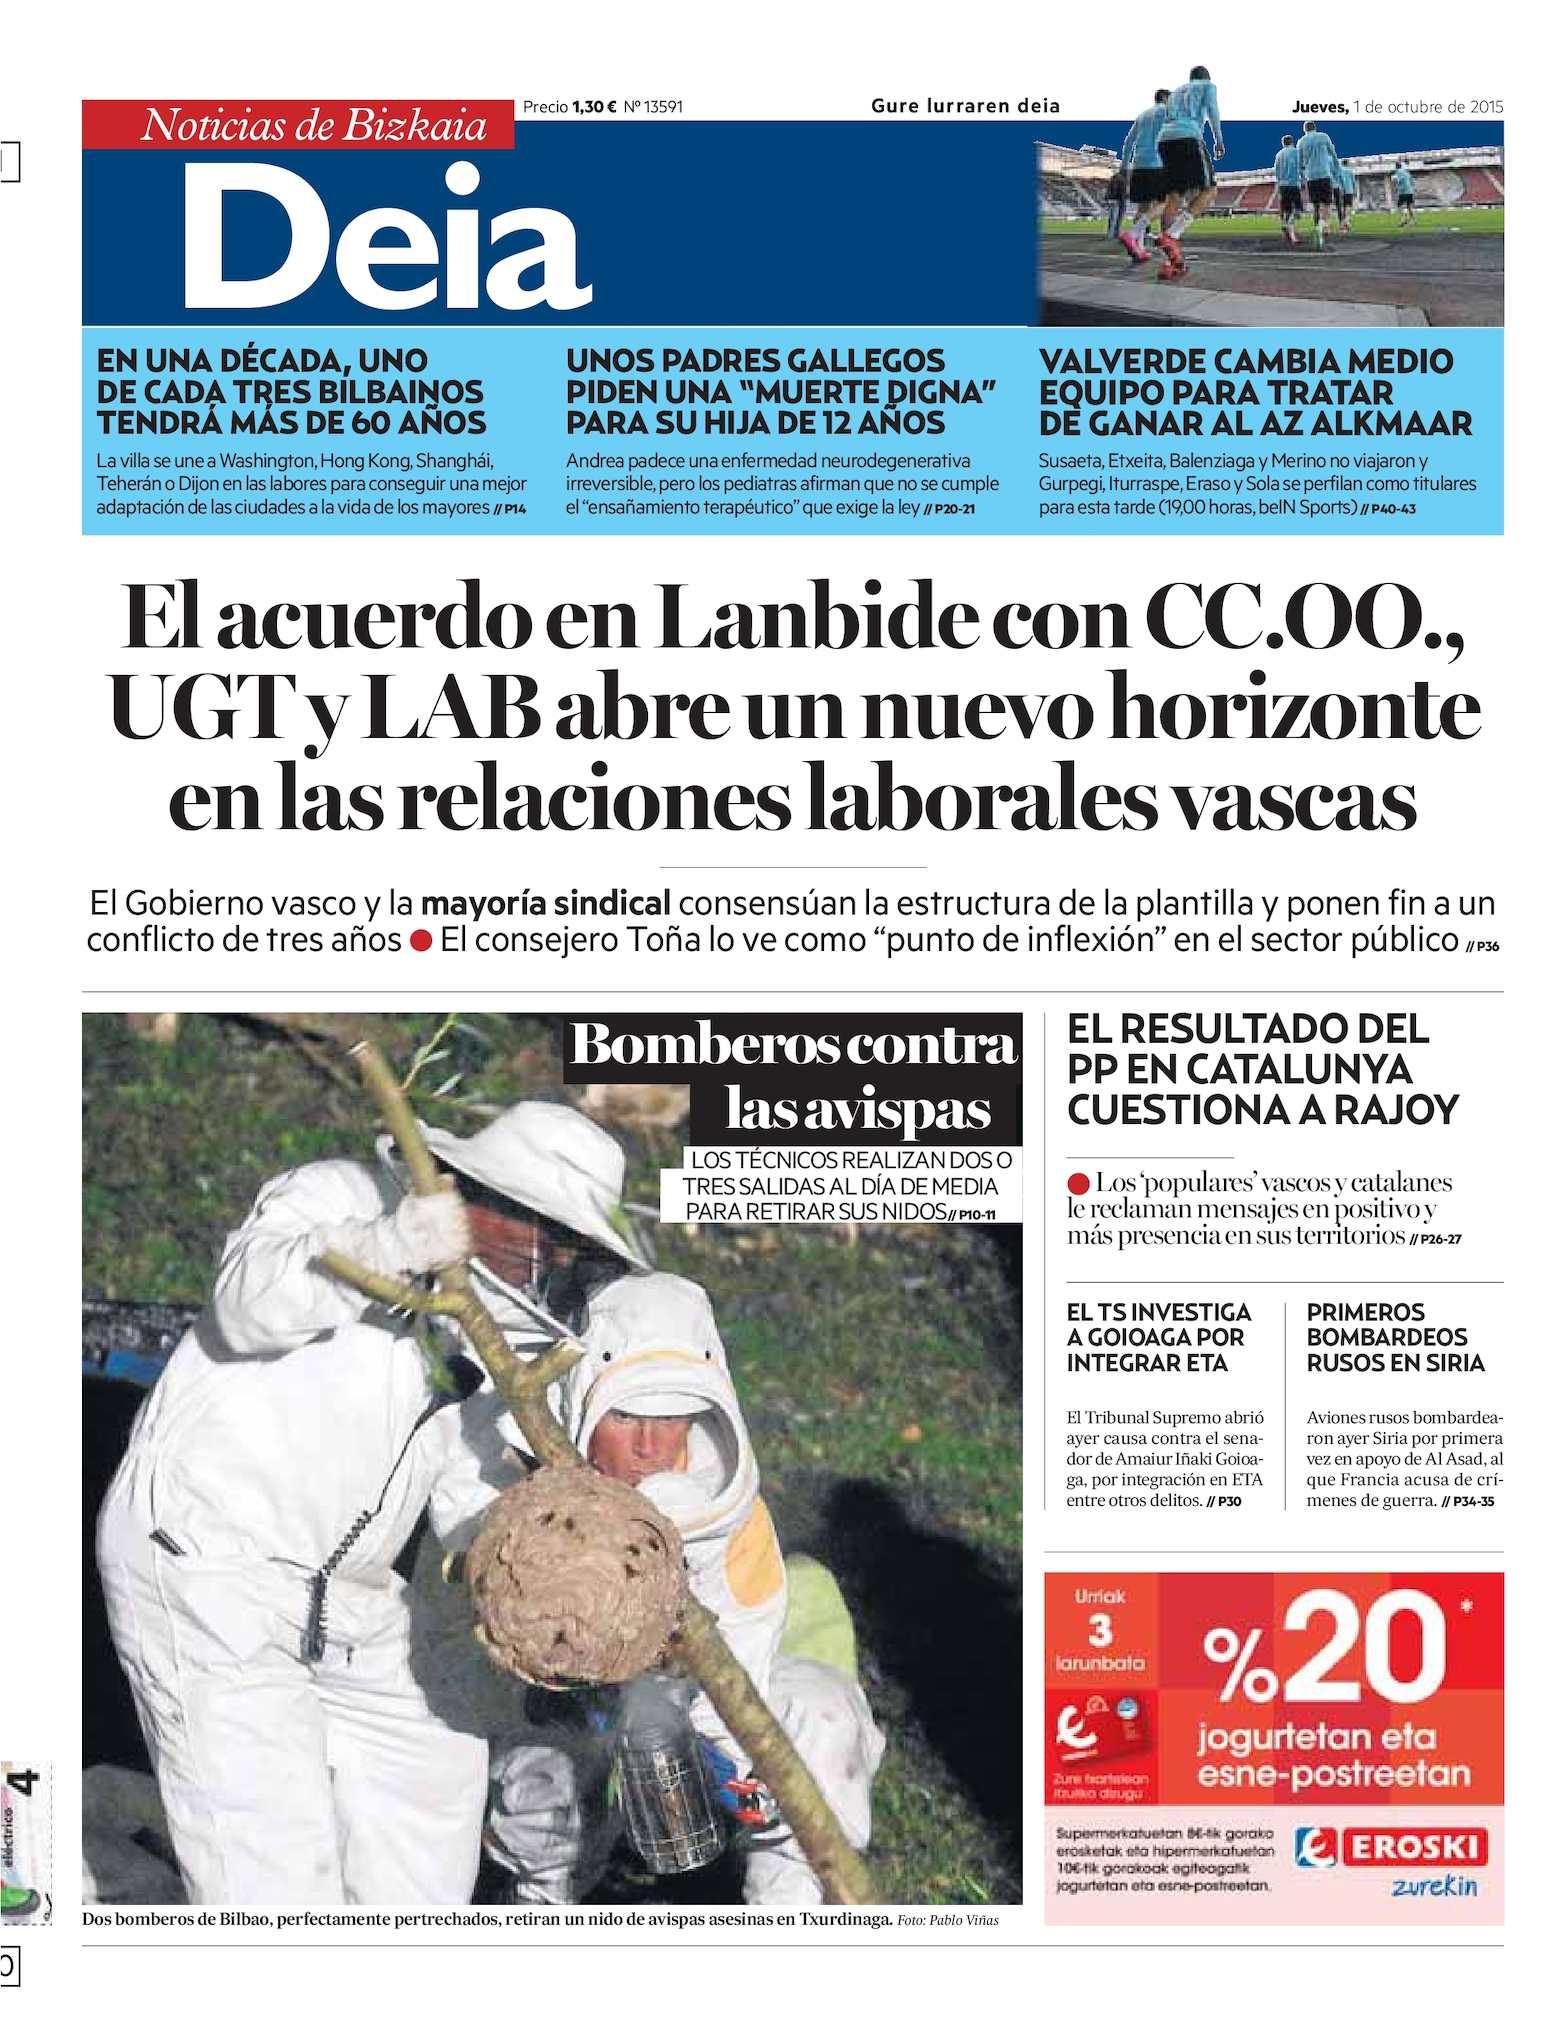 Calaméo - Deia 20151001